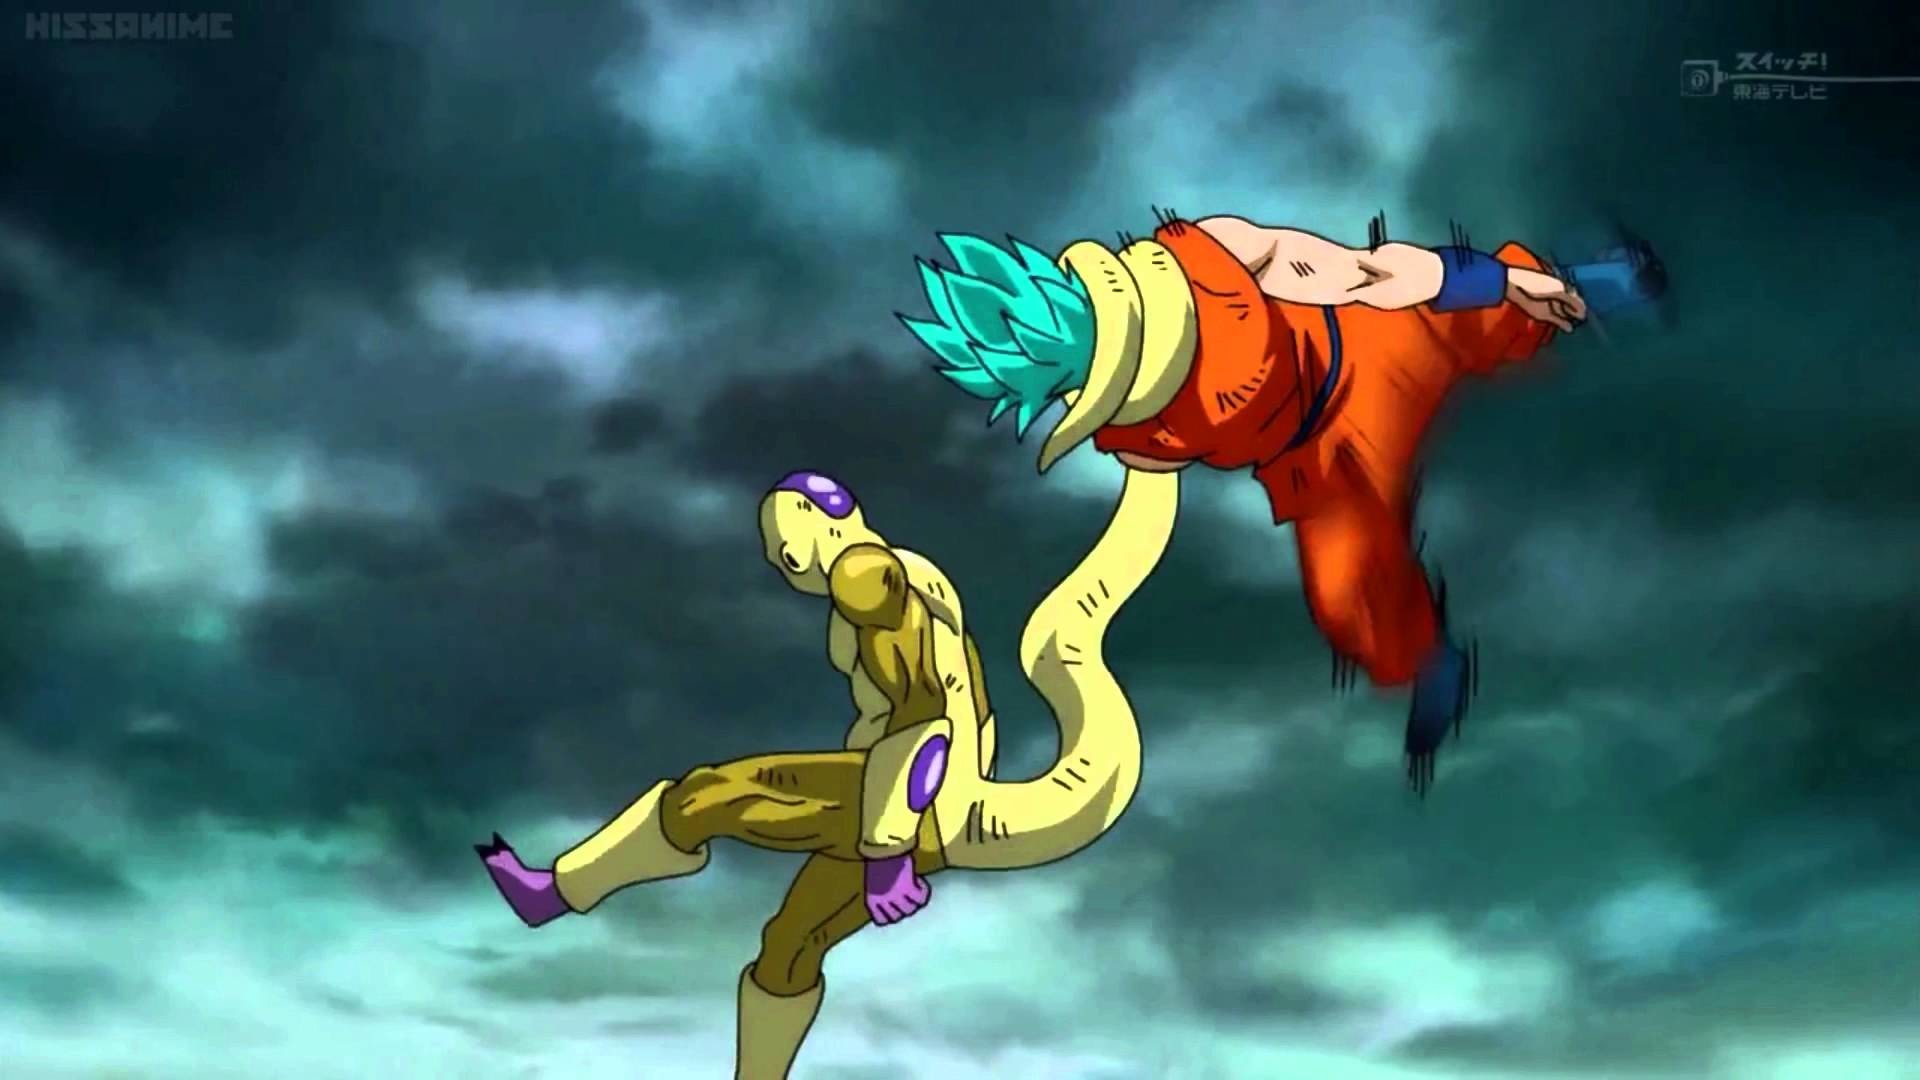 SSGSS Goku bites Golden Freeza's Tail